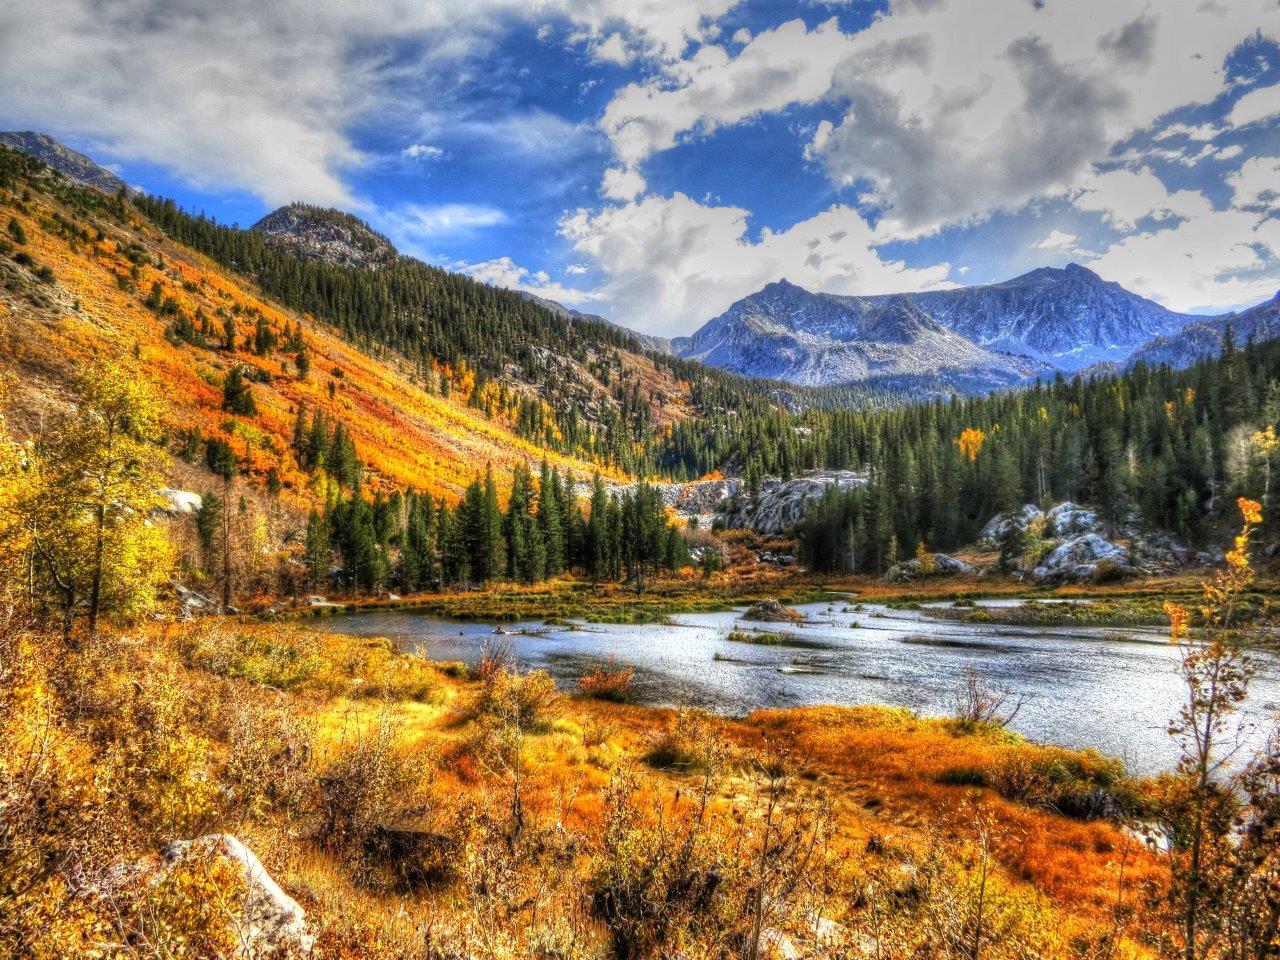 15-Sierra-Nevada-Mountains.jpg